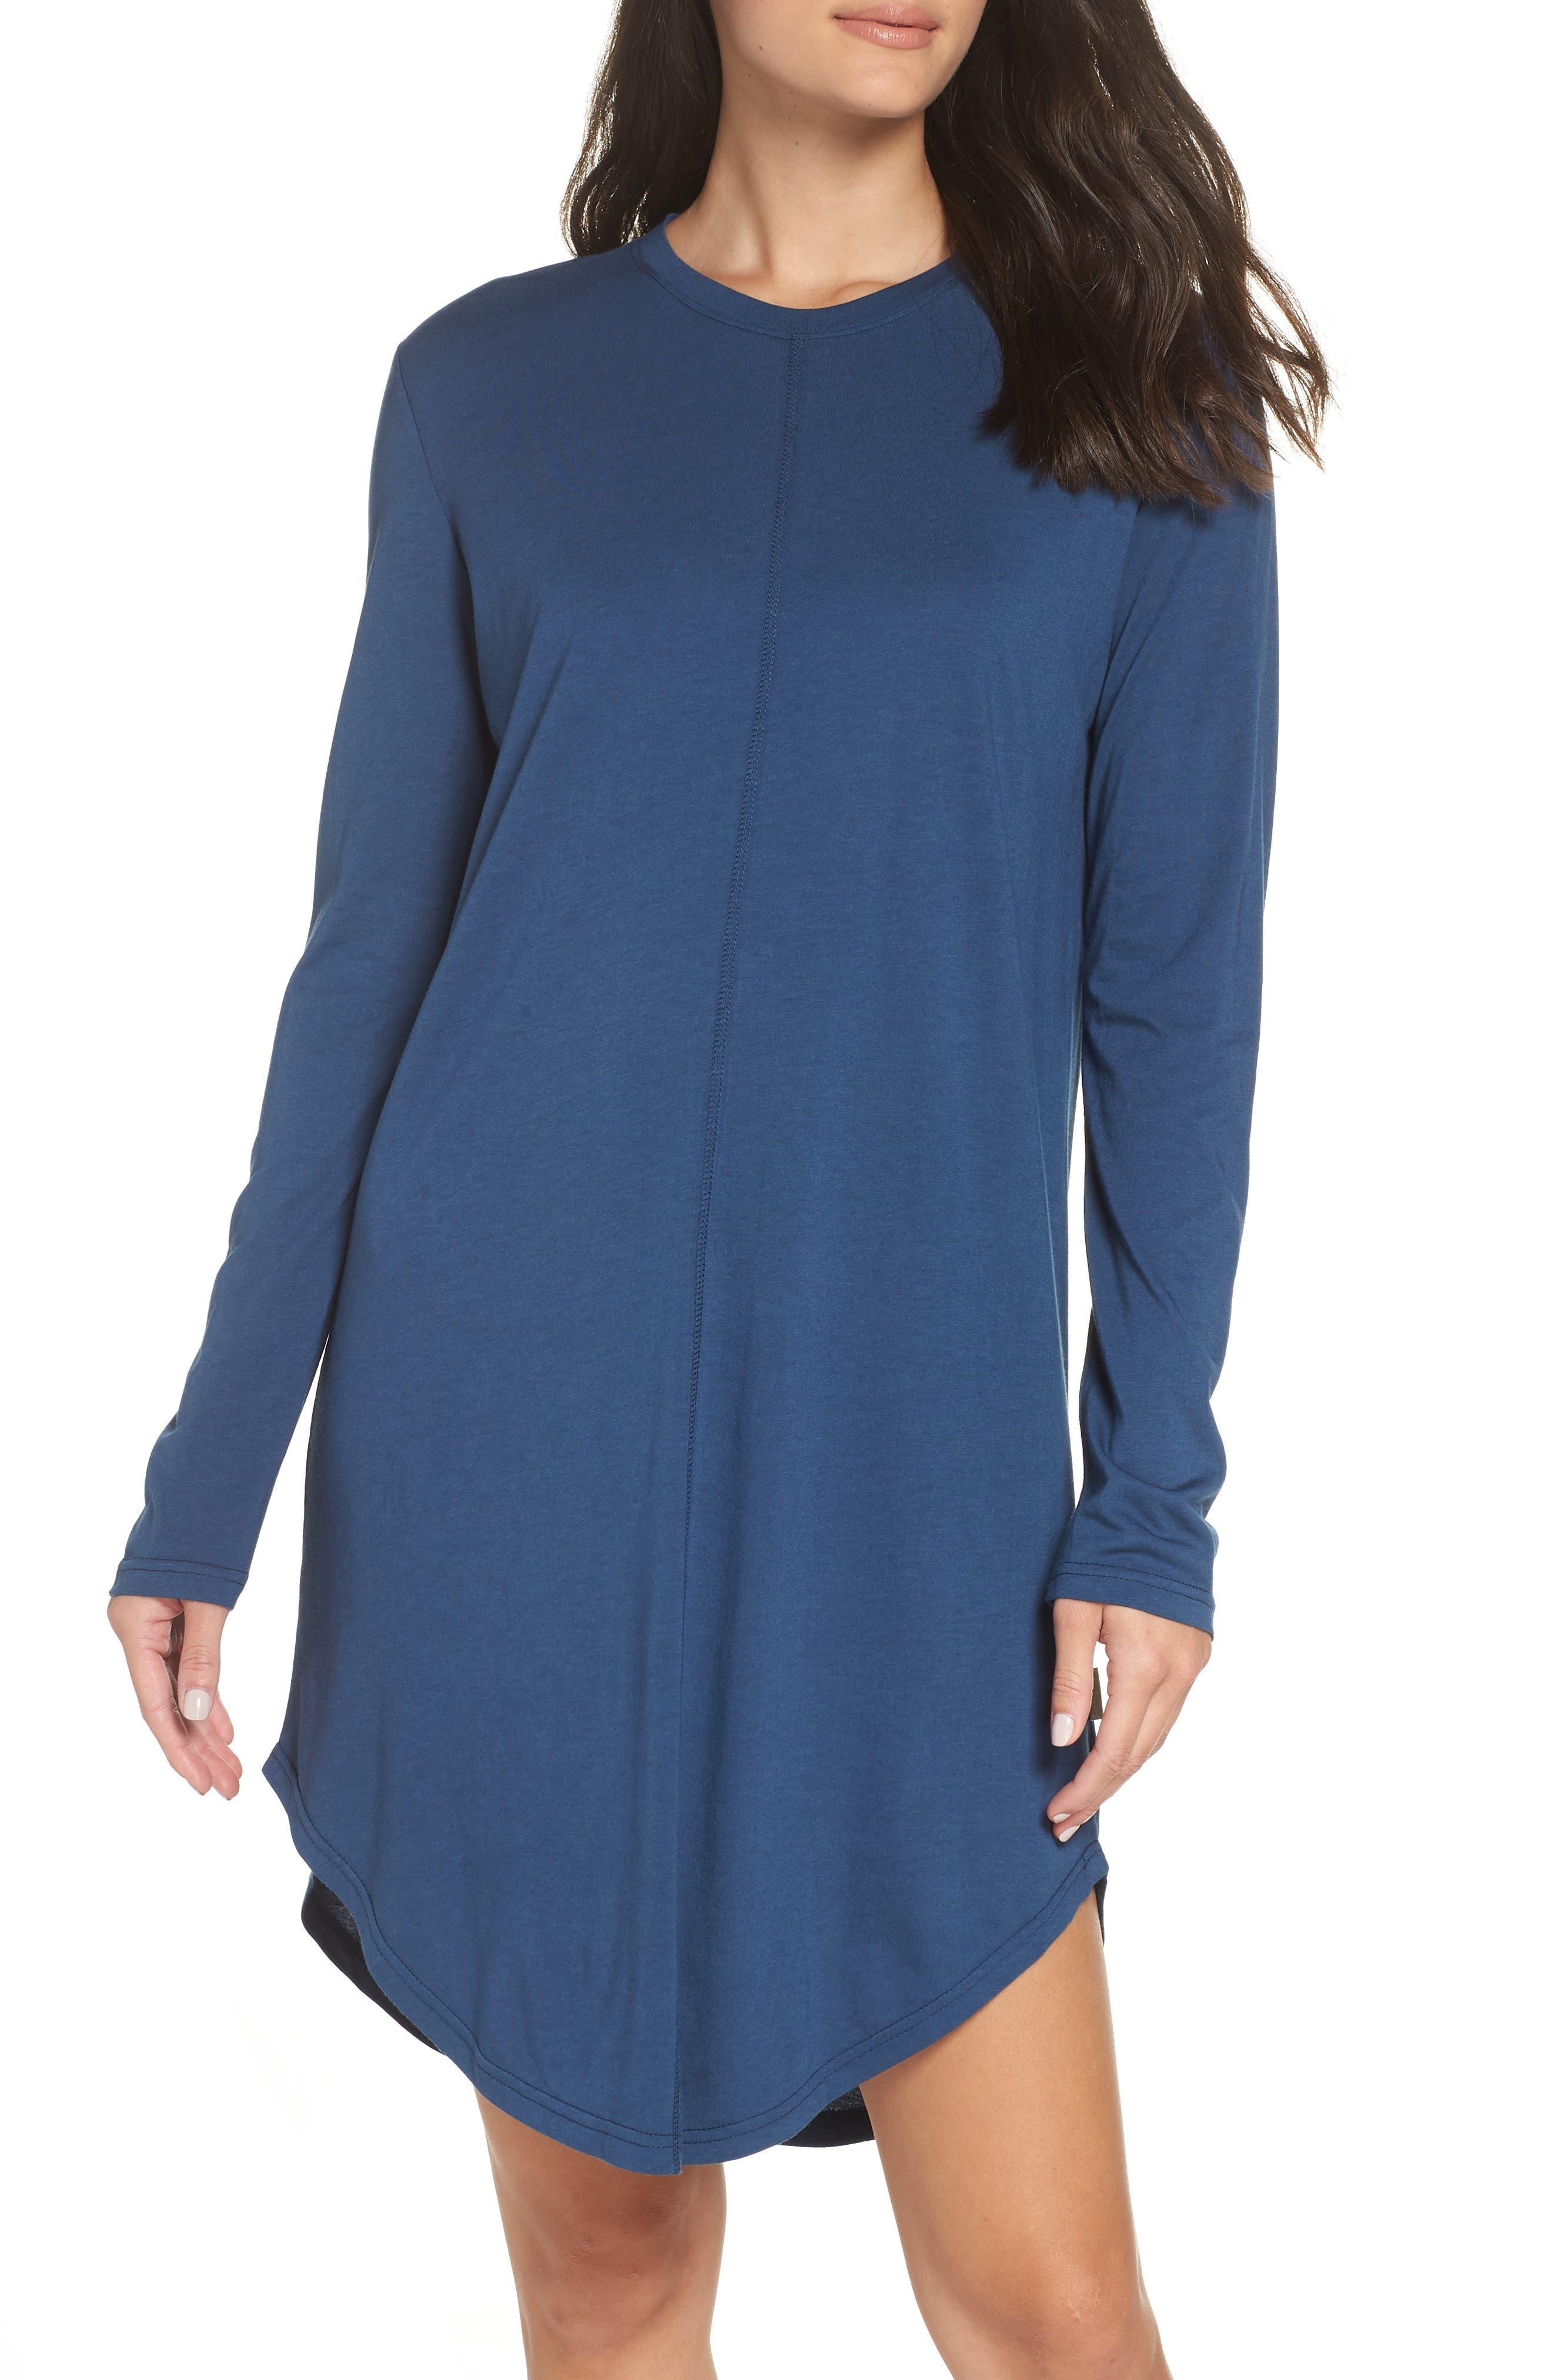 Chalmers Wednesday Sleep Shirt, Blue